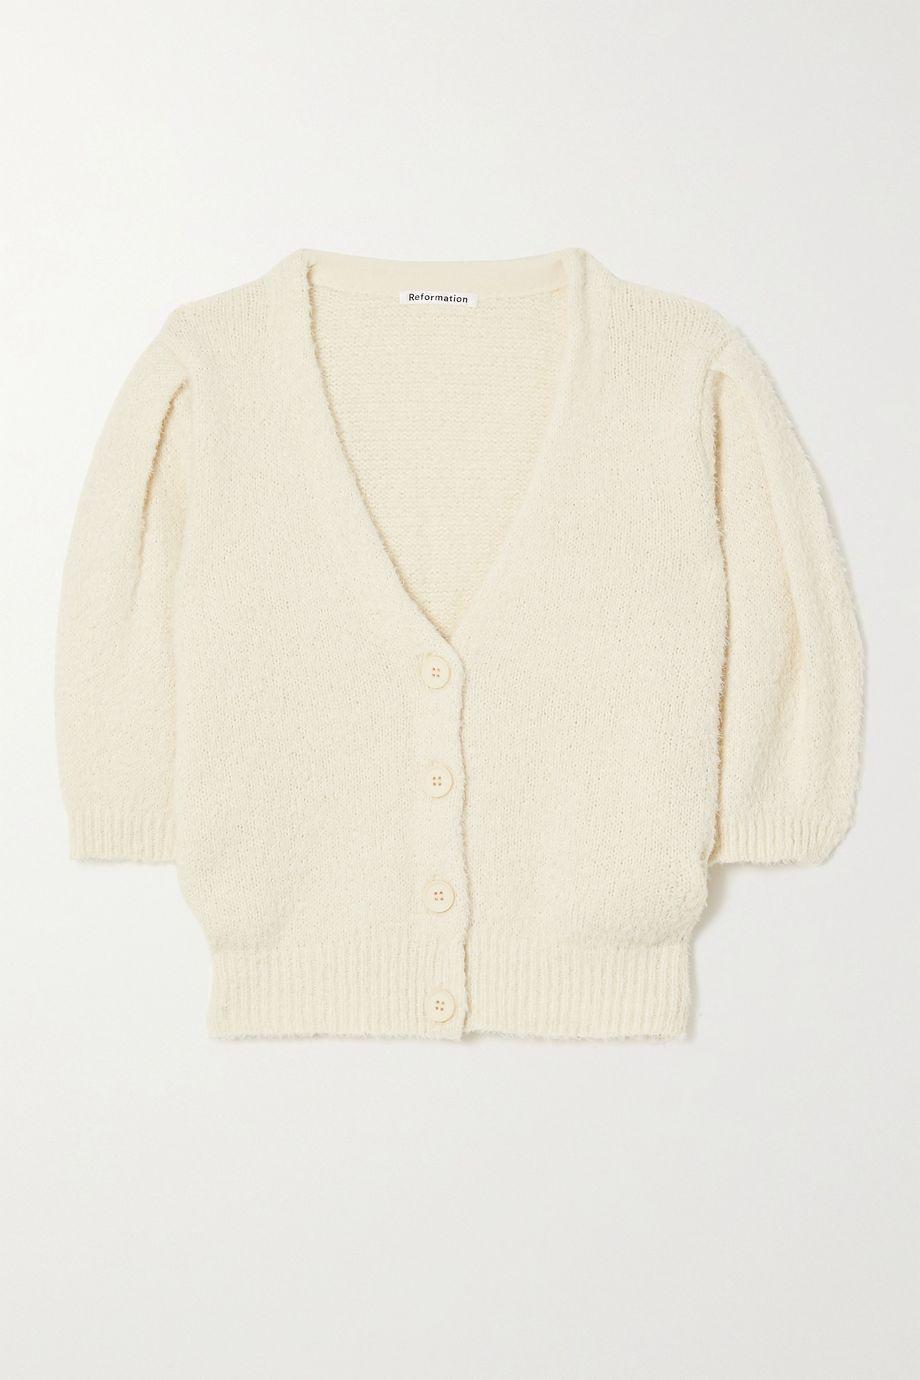 Reformation Hope cropped organic cotton cardigan